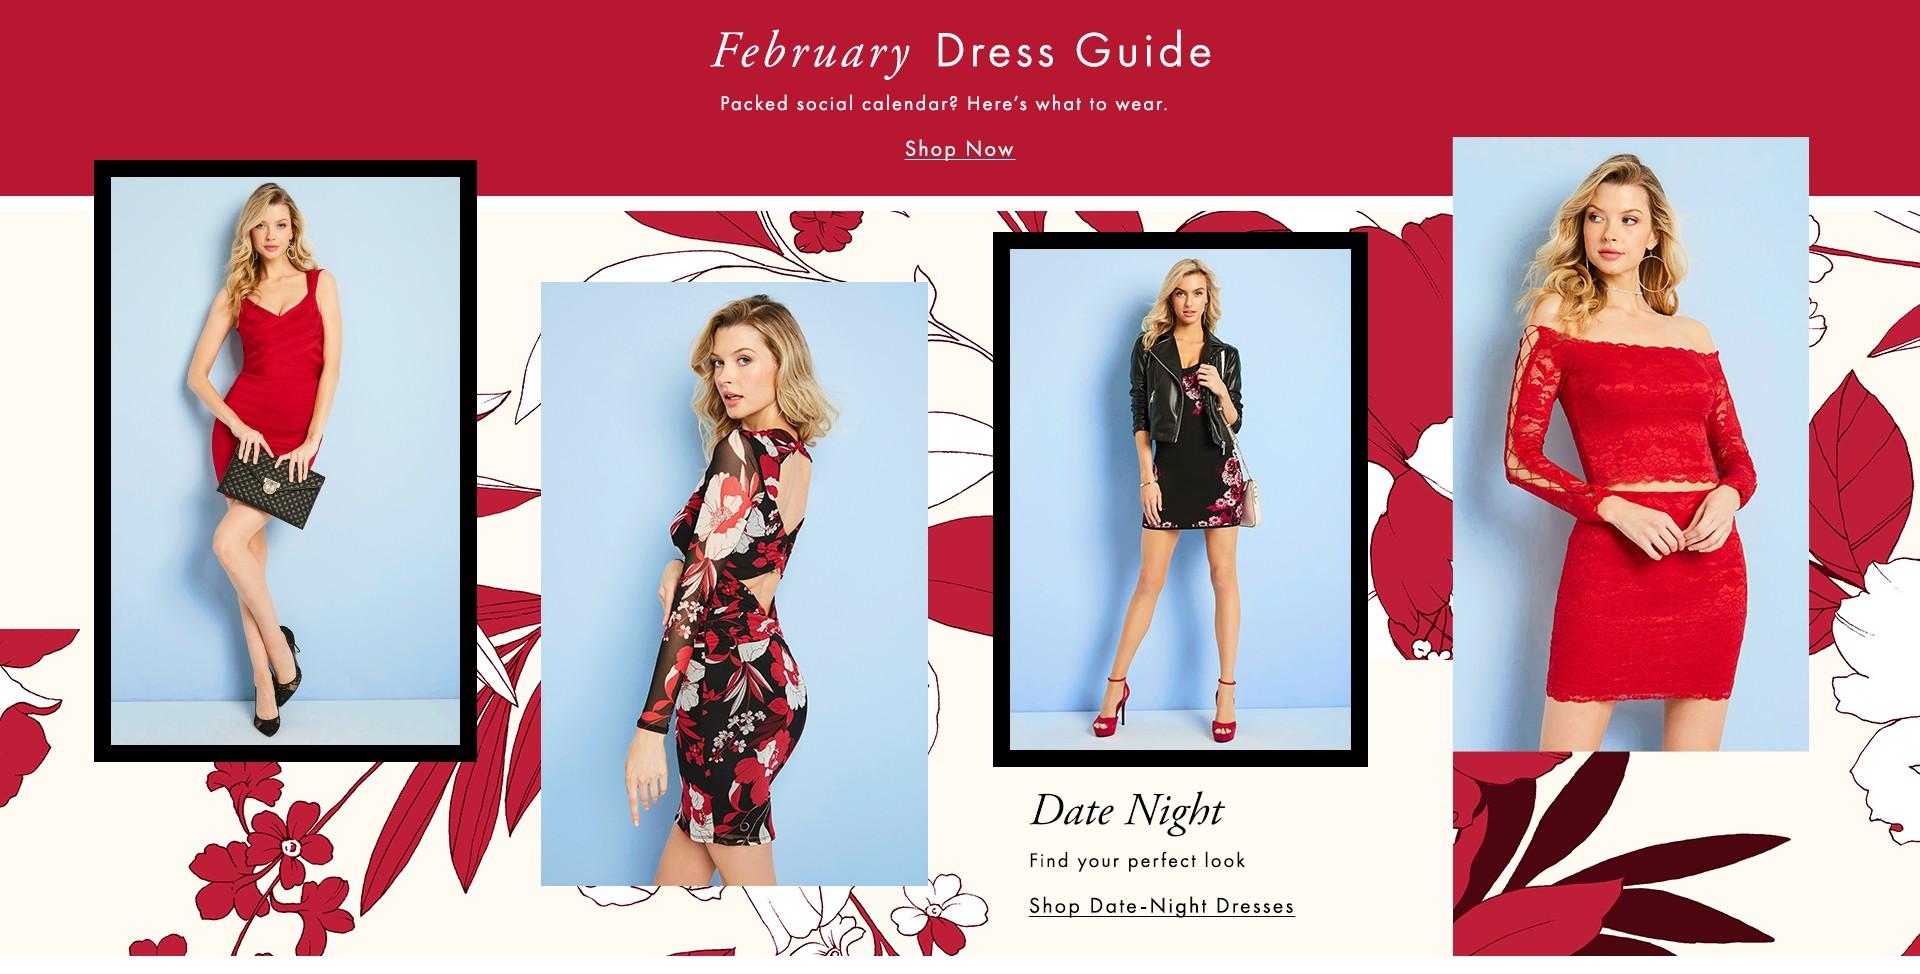 February Dress Guide